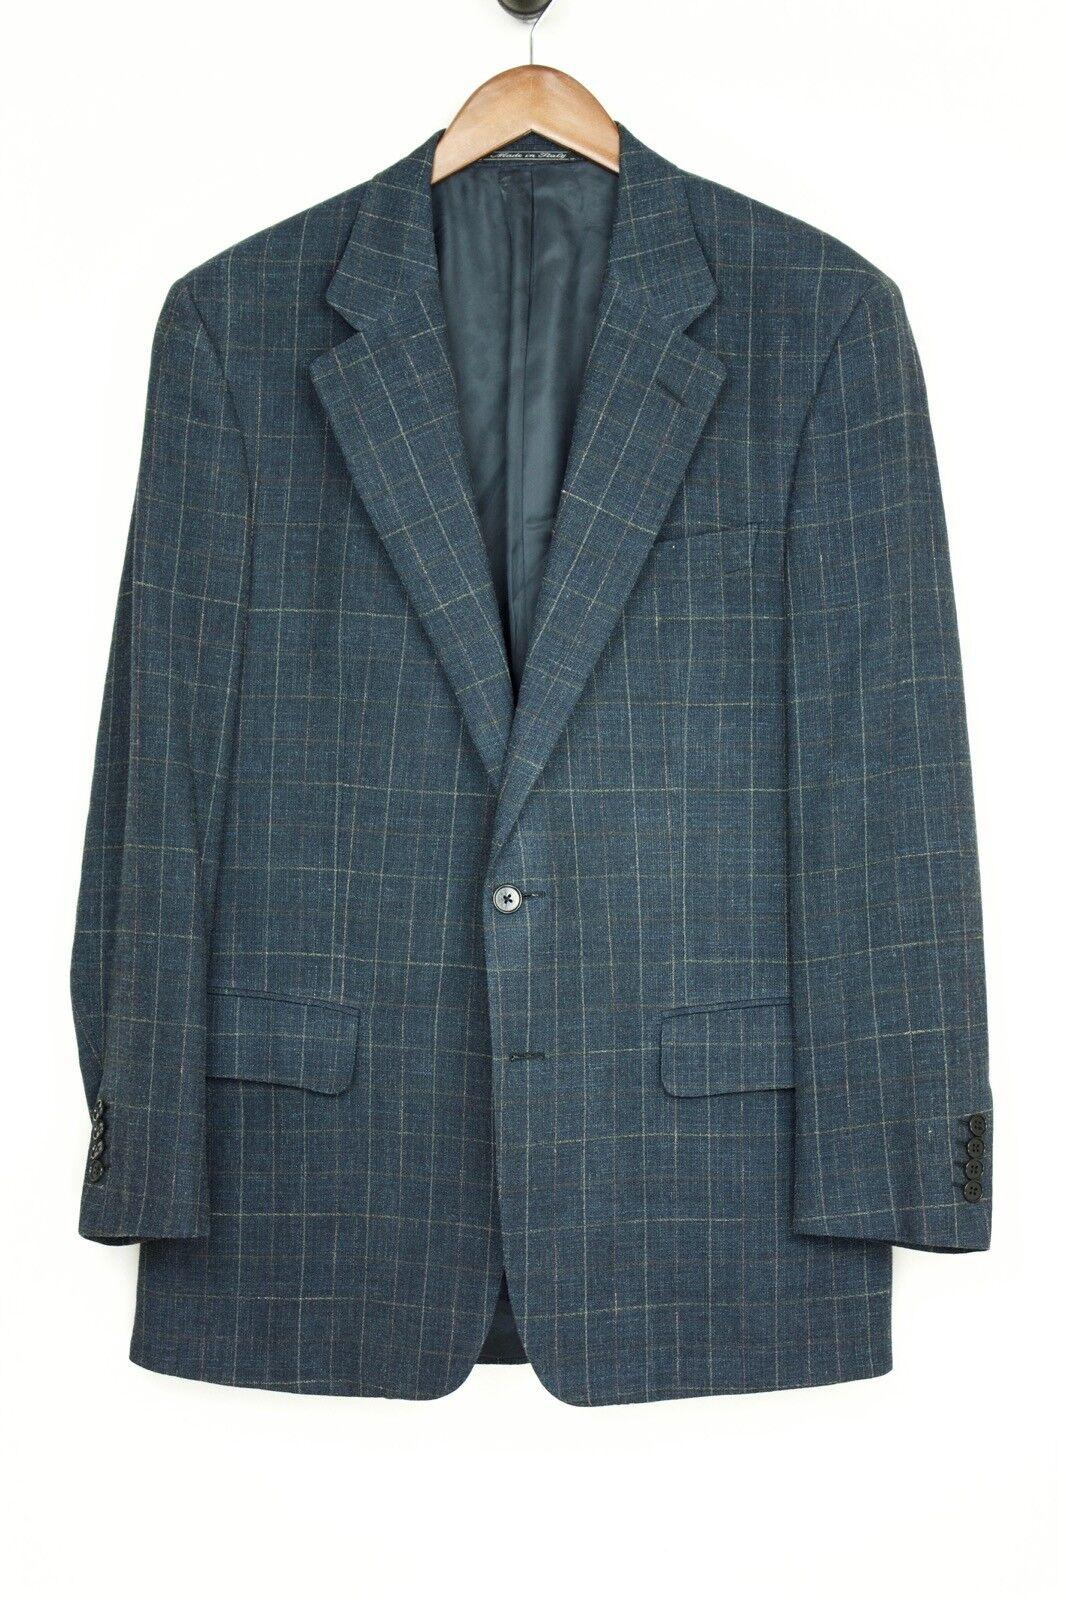 Dunhill x Ermenegildo Zegna Wool Linen Sport Coat 40L Dark bluee Beige Windowpane